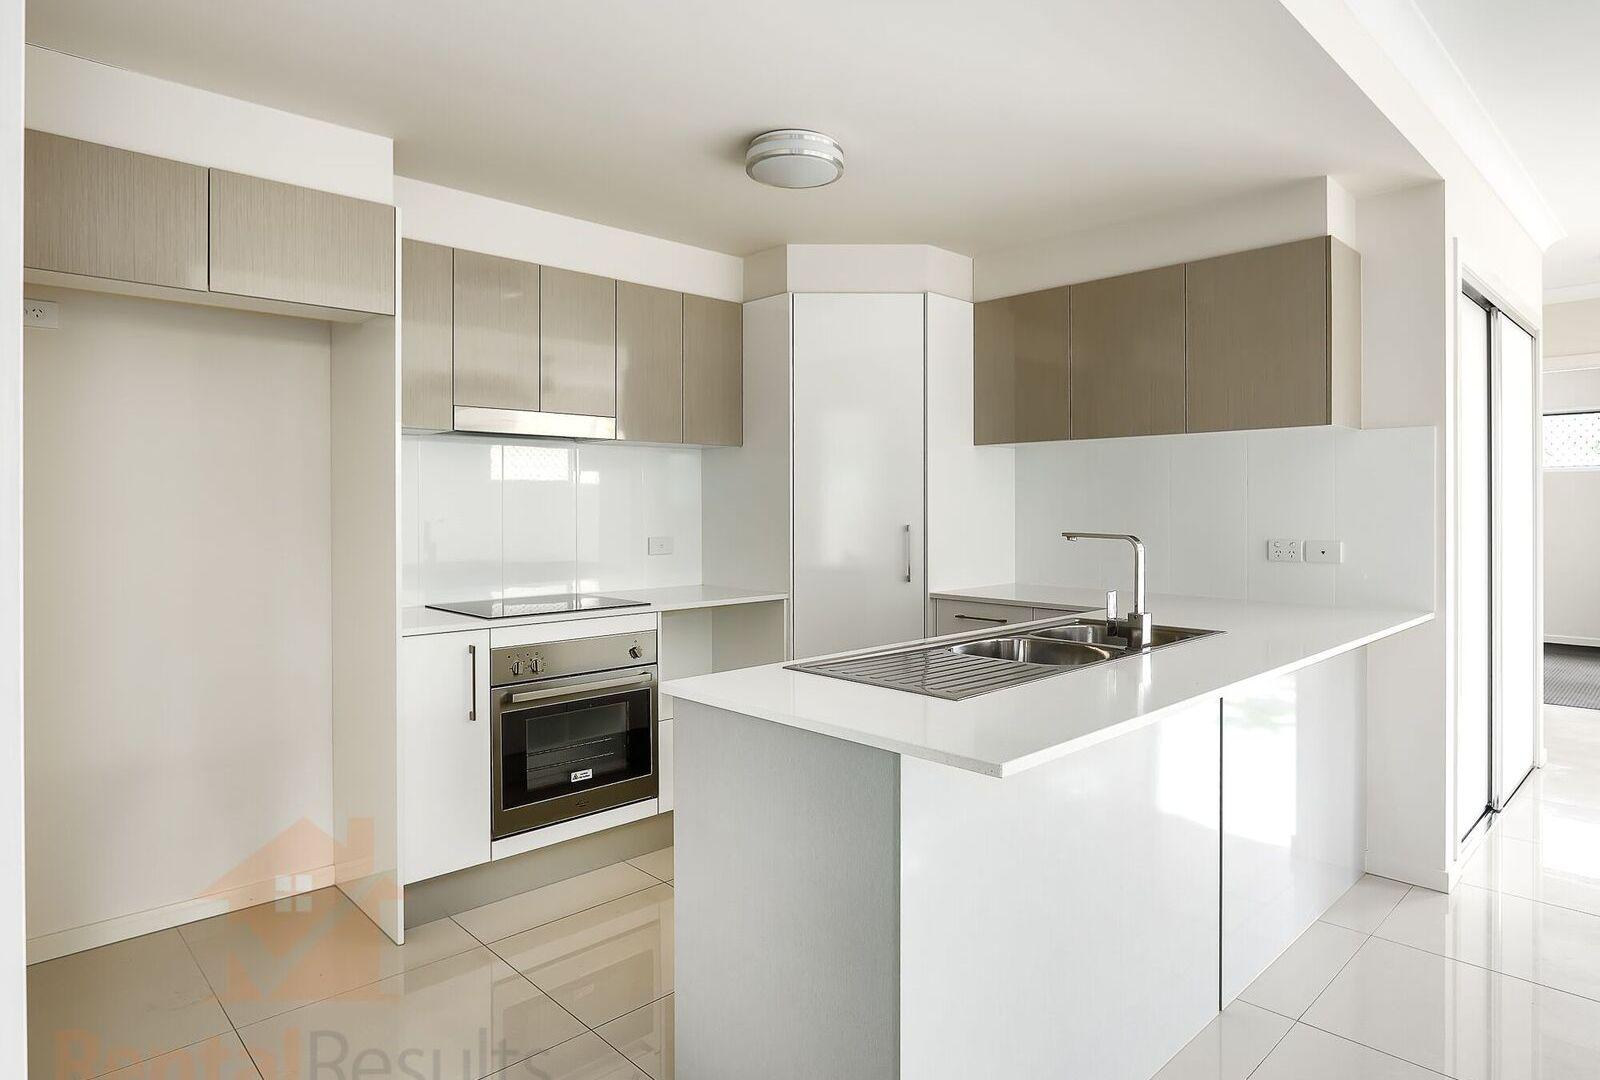 7/52 Gaythorne Road, Gaythorne QLD 4051, Image 1